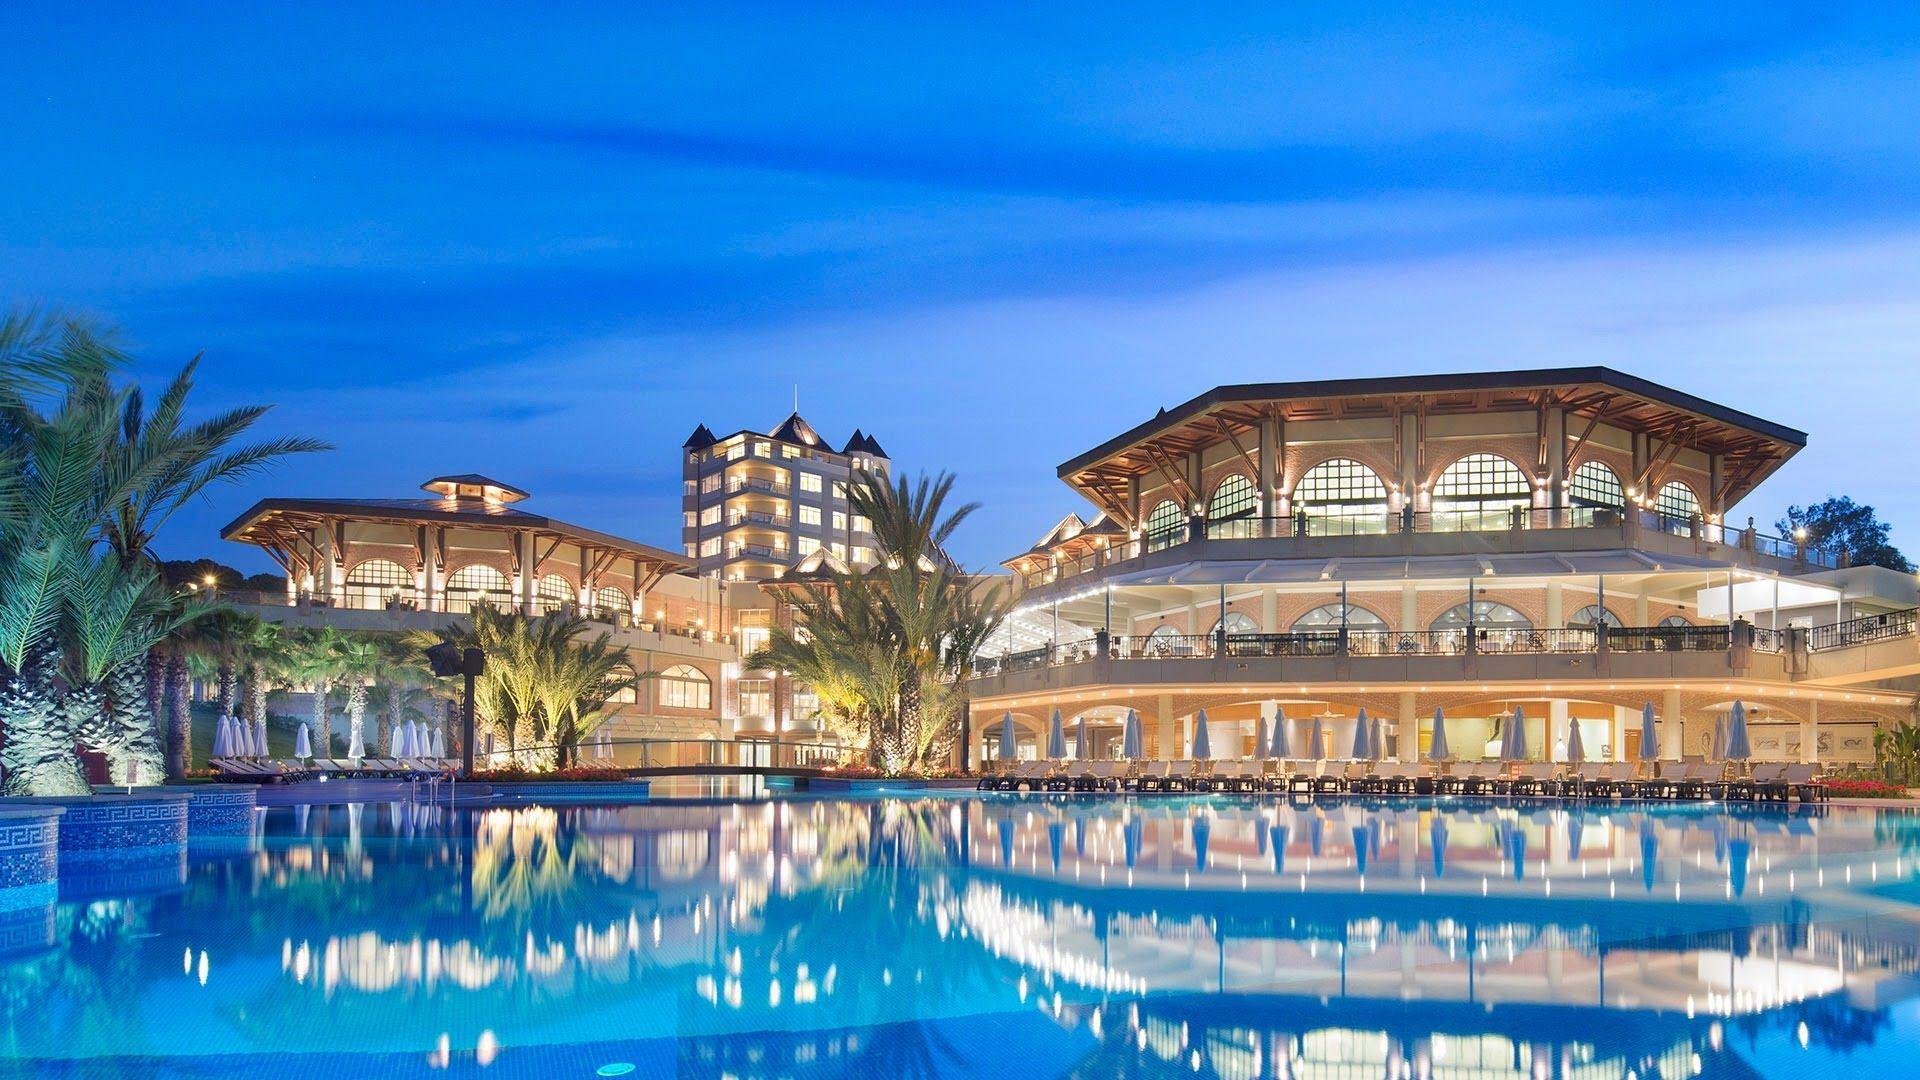 Antalya Hotels In Turkey Belek Papillon Zeugma Relaxury Hotel